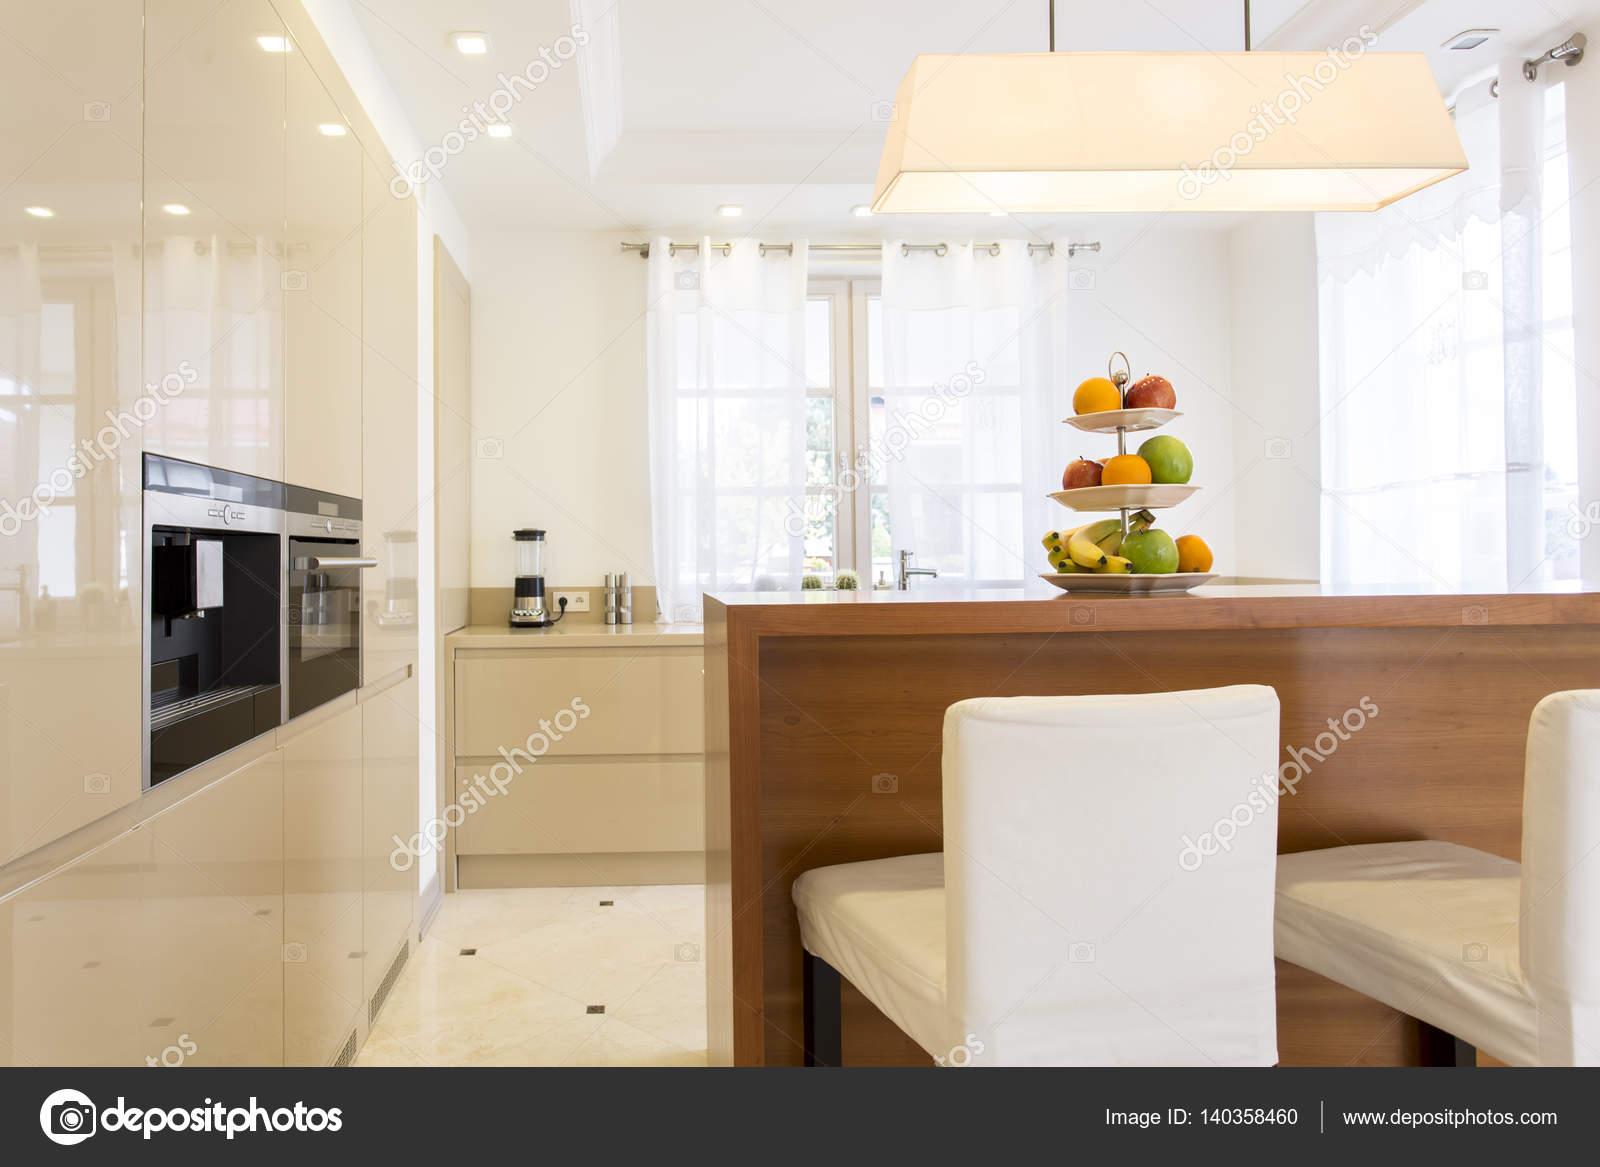 Cucina minimalista con armadi a muro — Foto Stock © photographee.eu ...